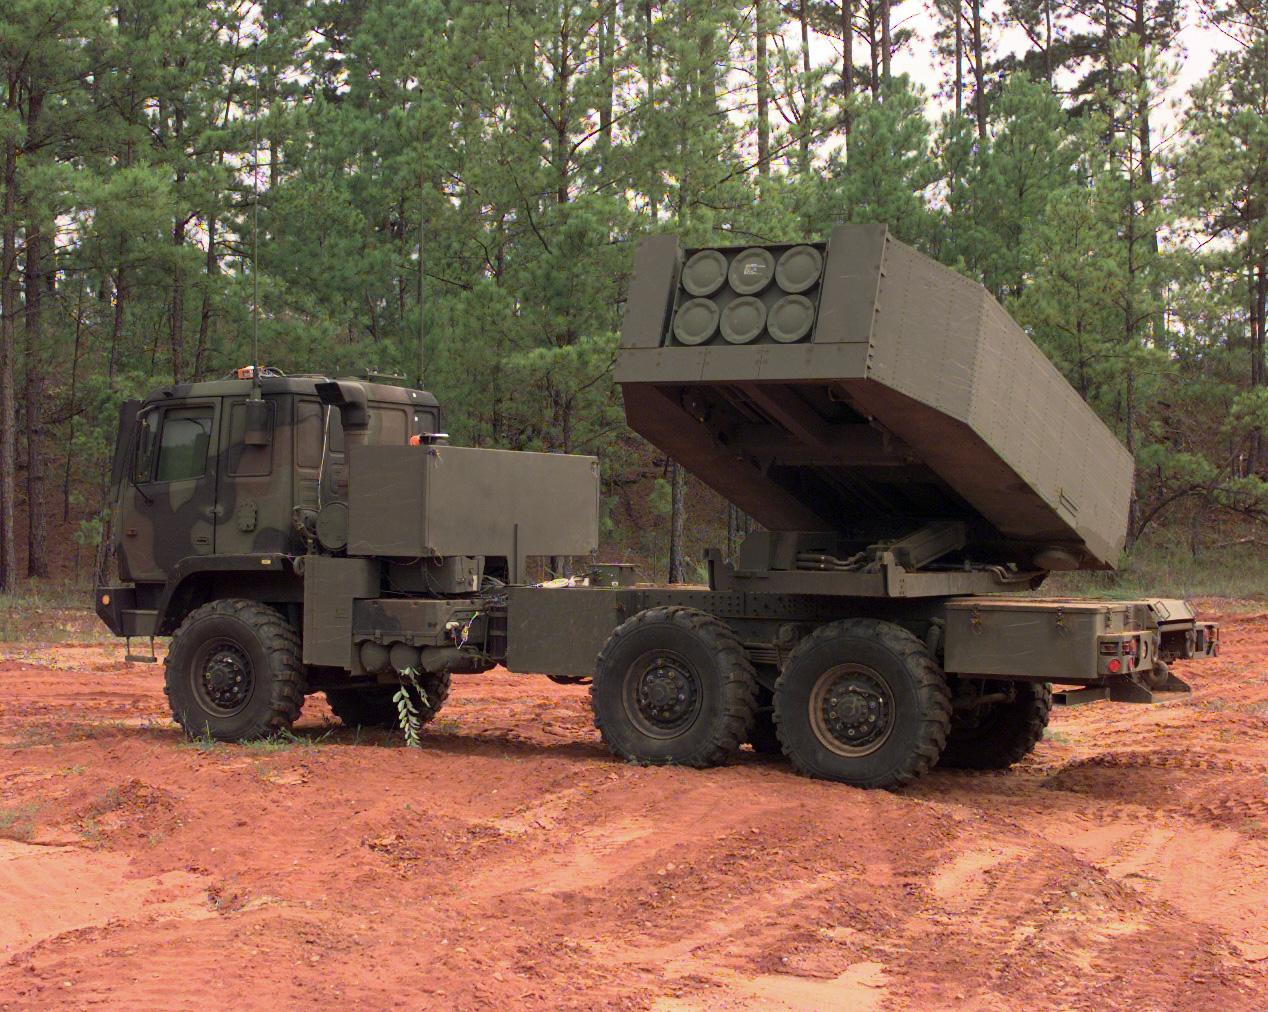 High Mobility Artillery Rocket System (HIMARS)  - Kép forrása: U.S. Army / Spc. Russell J. Good